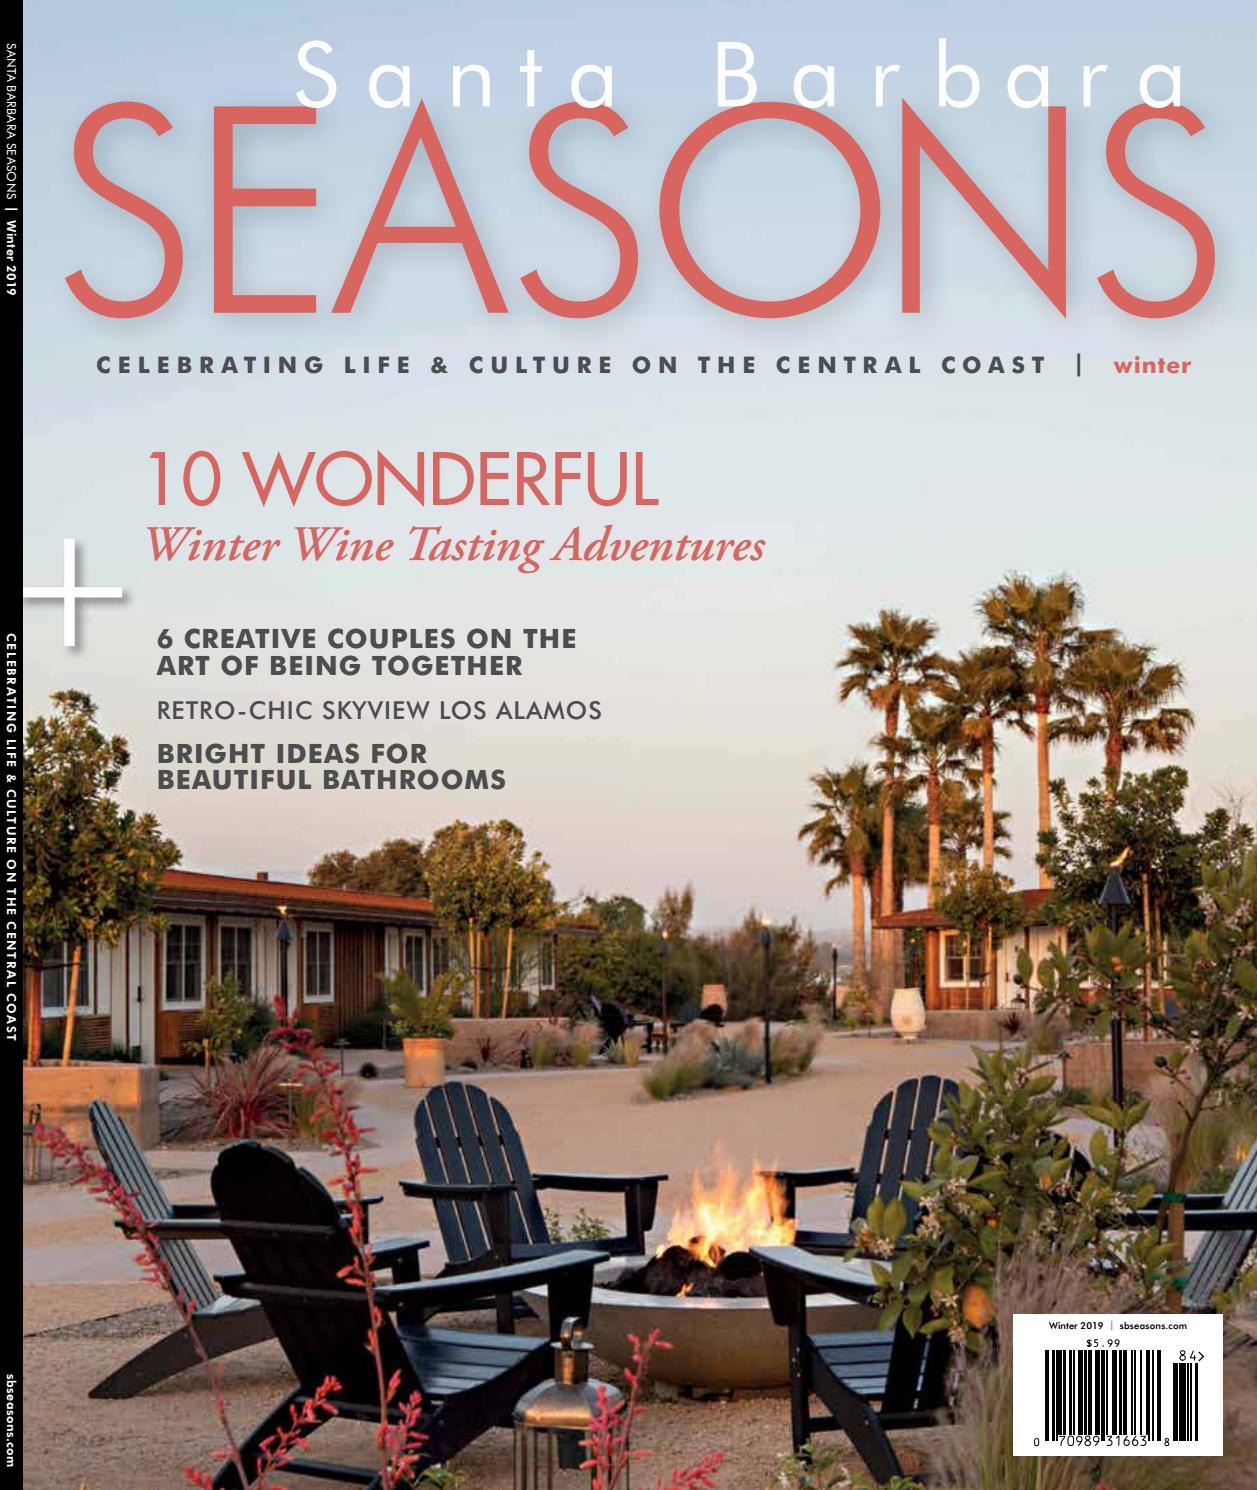 Santa Barbara Seasons Magazine Winter 2019 Issue By